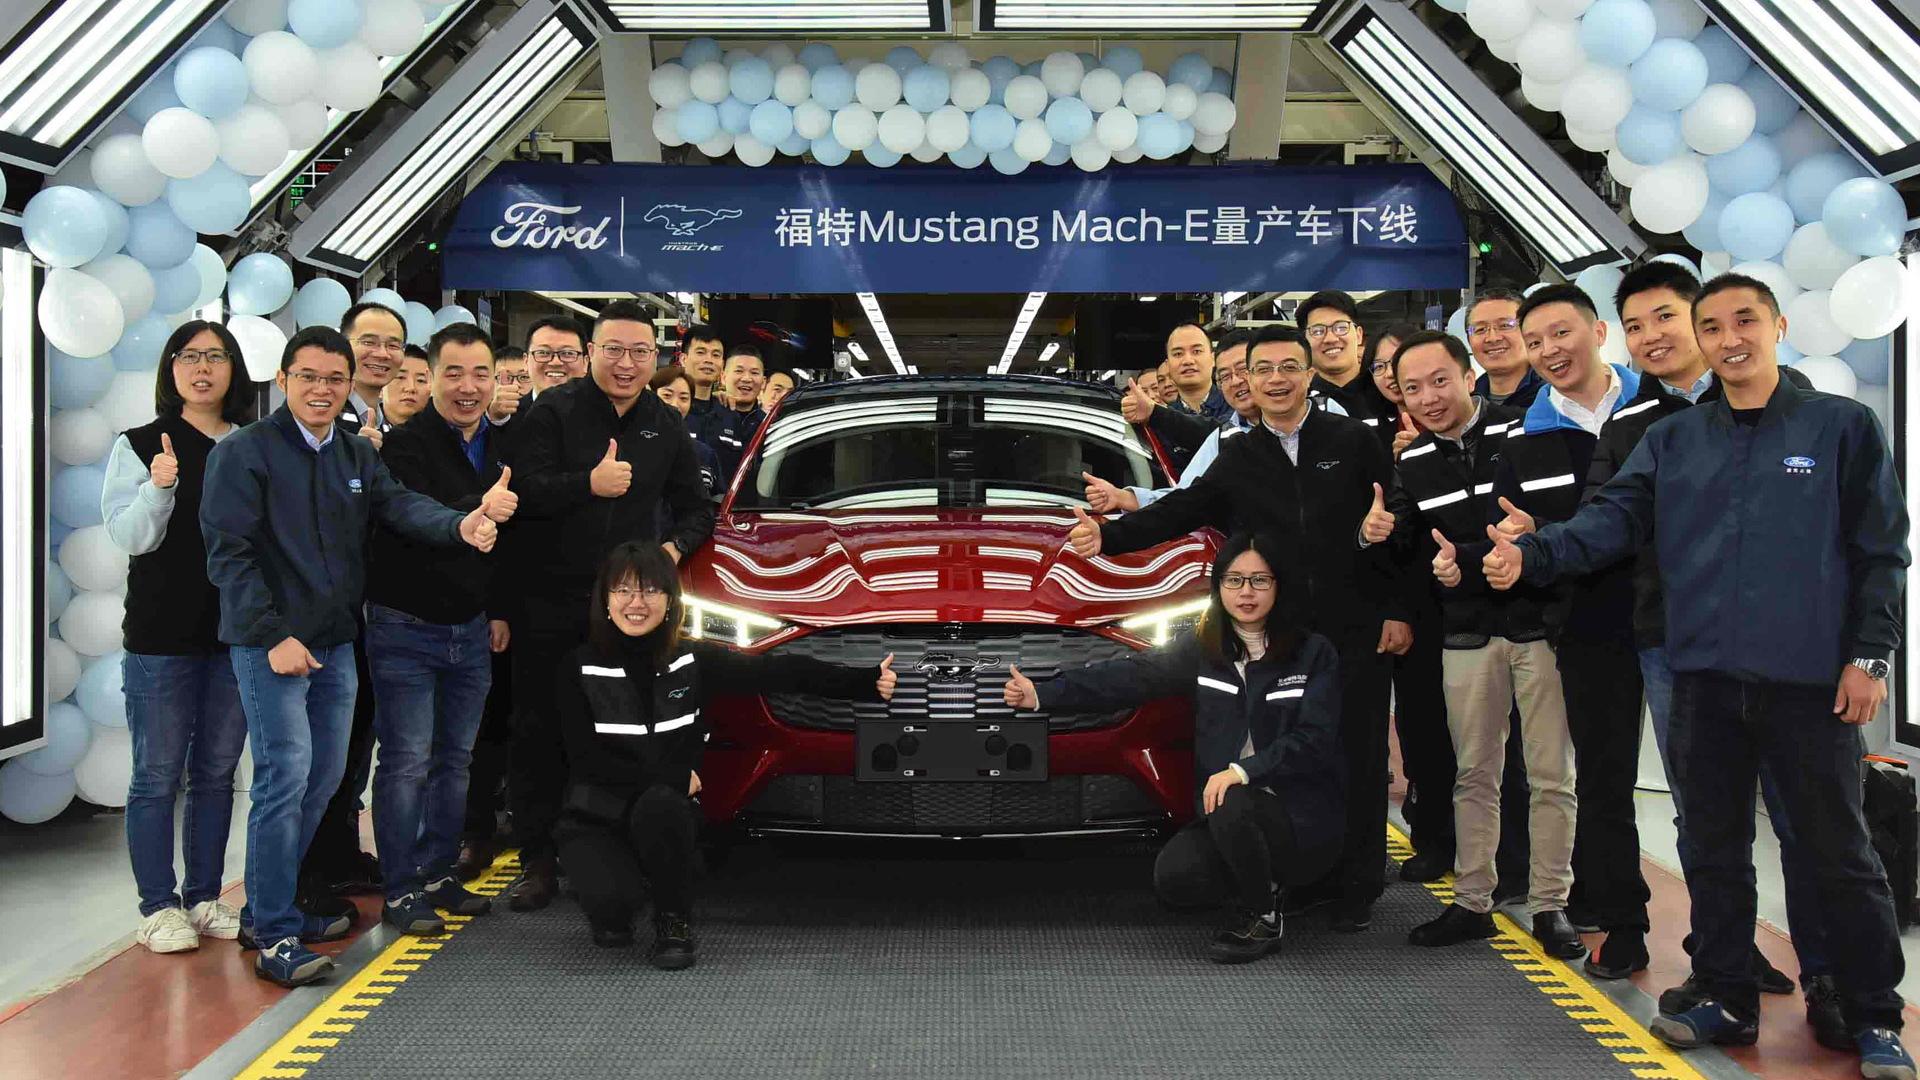 2021 Ford Mustang Mach-E production in Chongqing, China